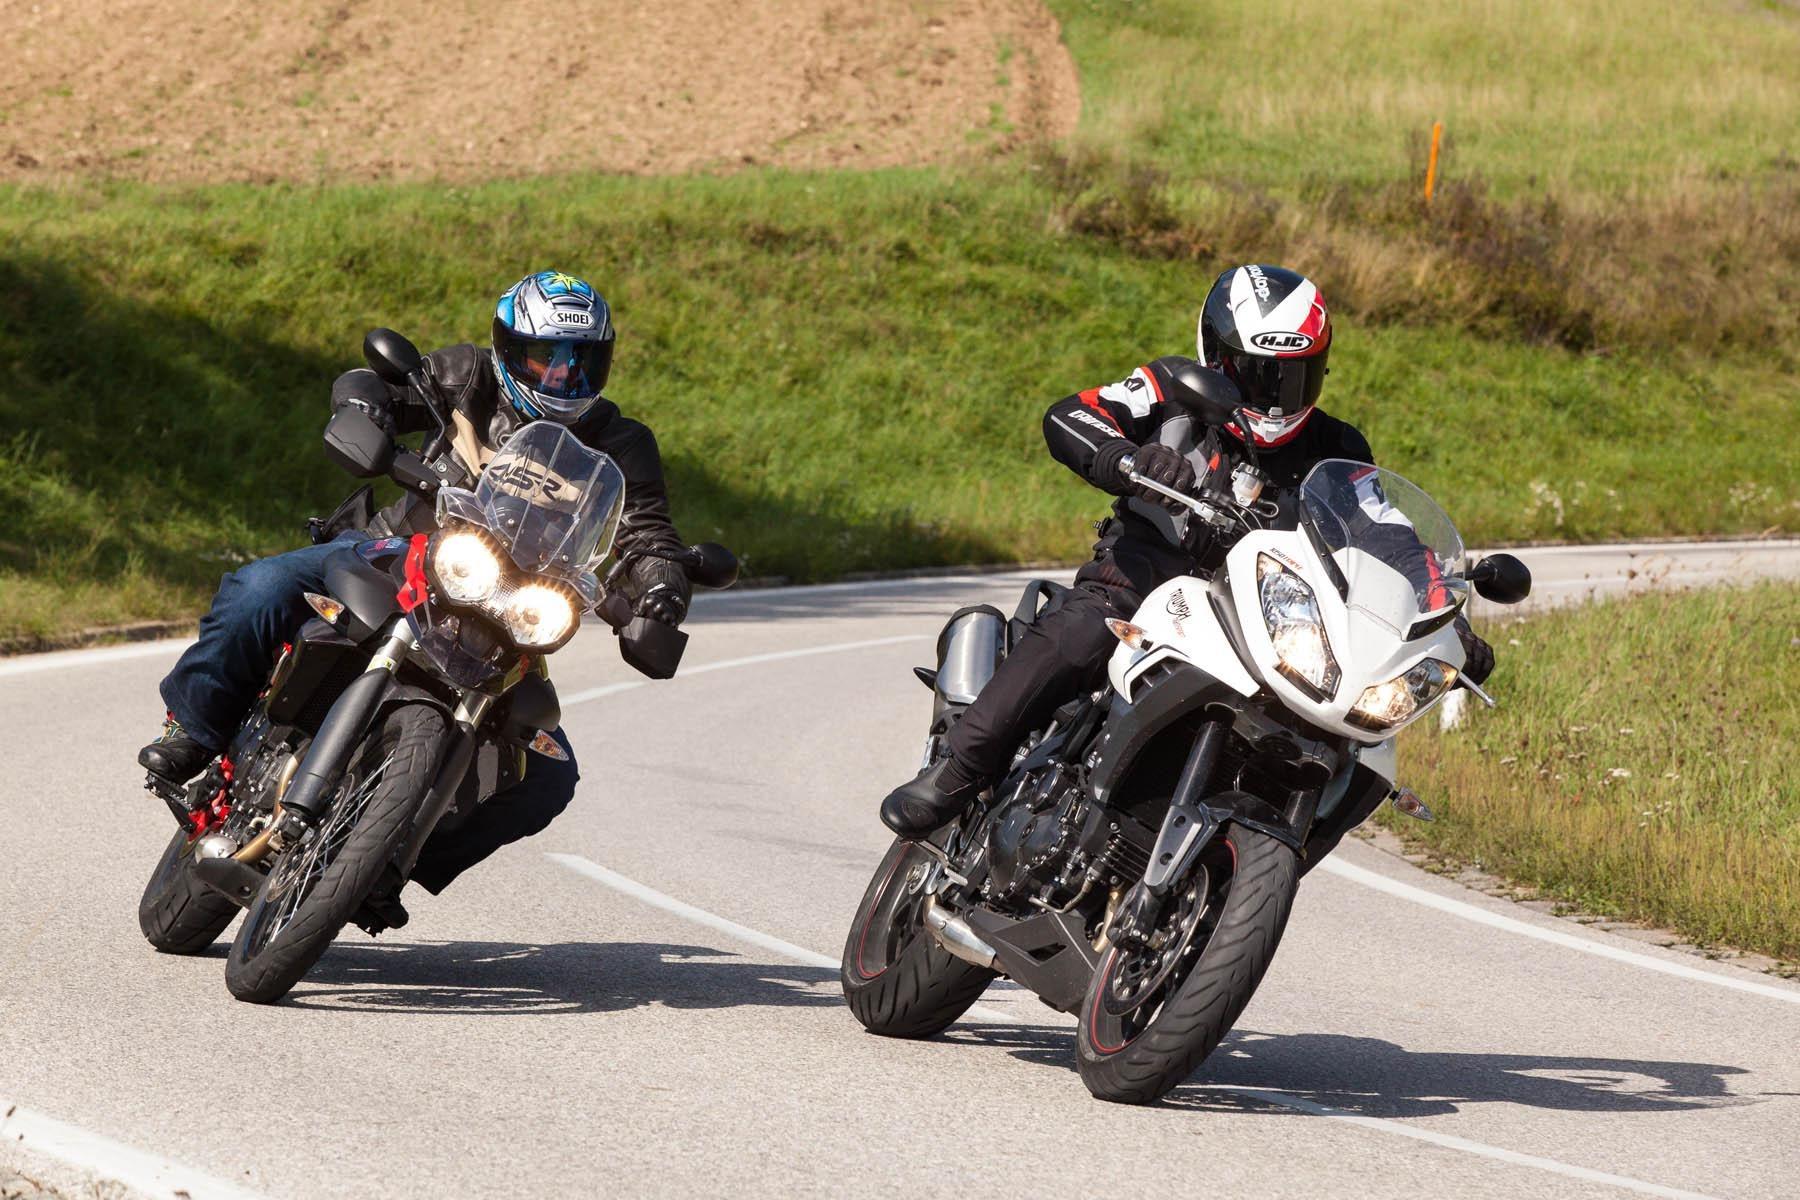 Triumph Tiger Xc Vs Kawasaki Versys